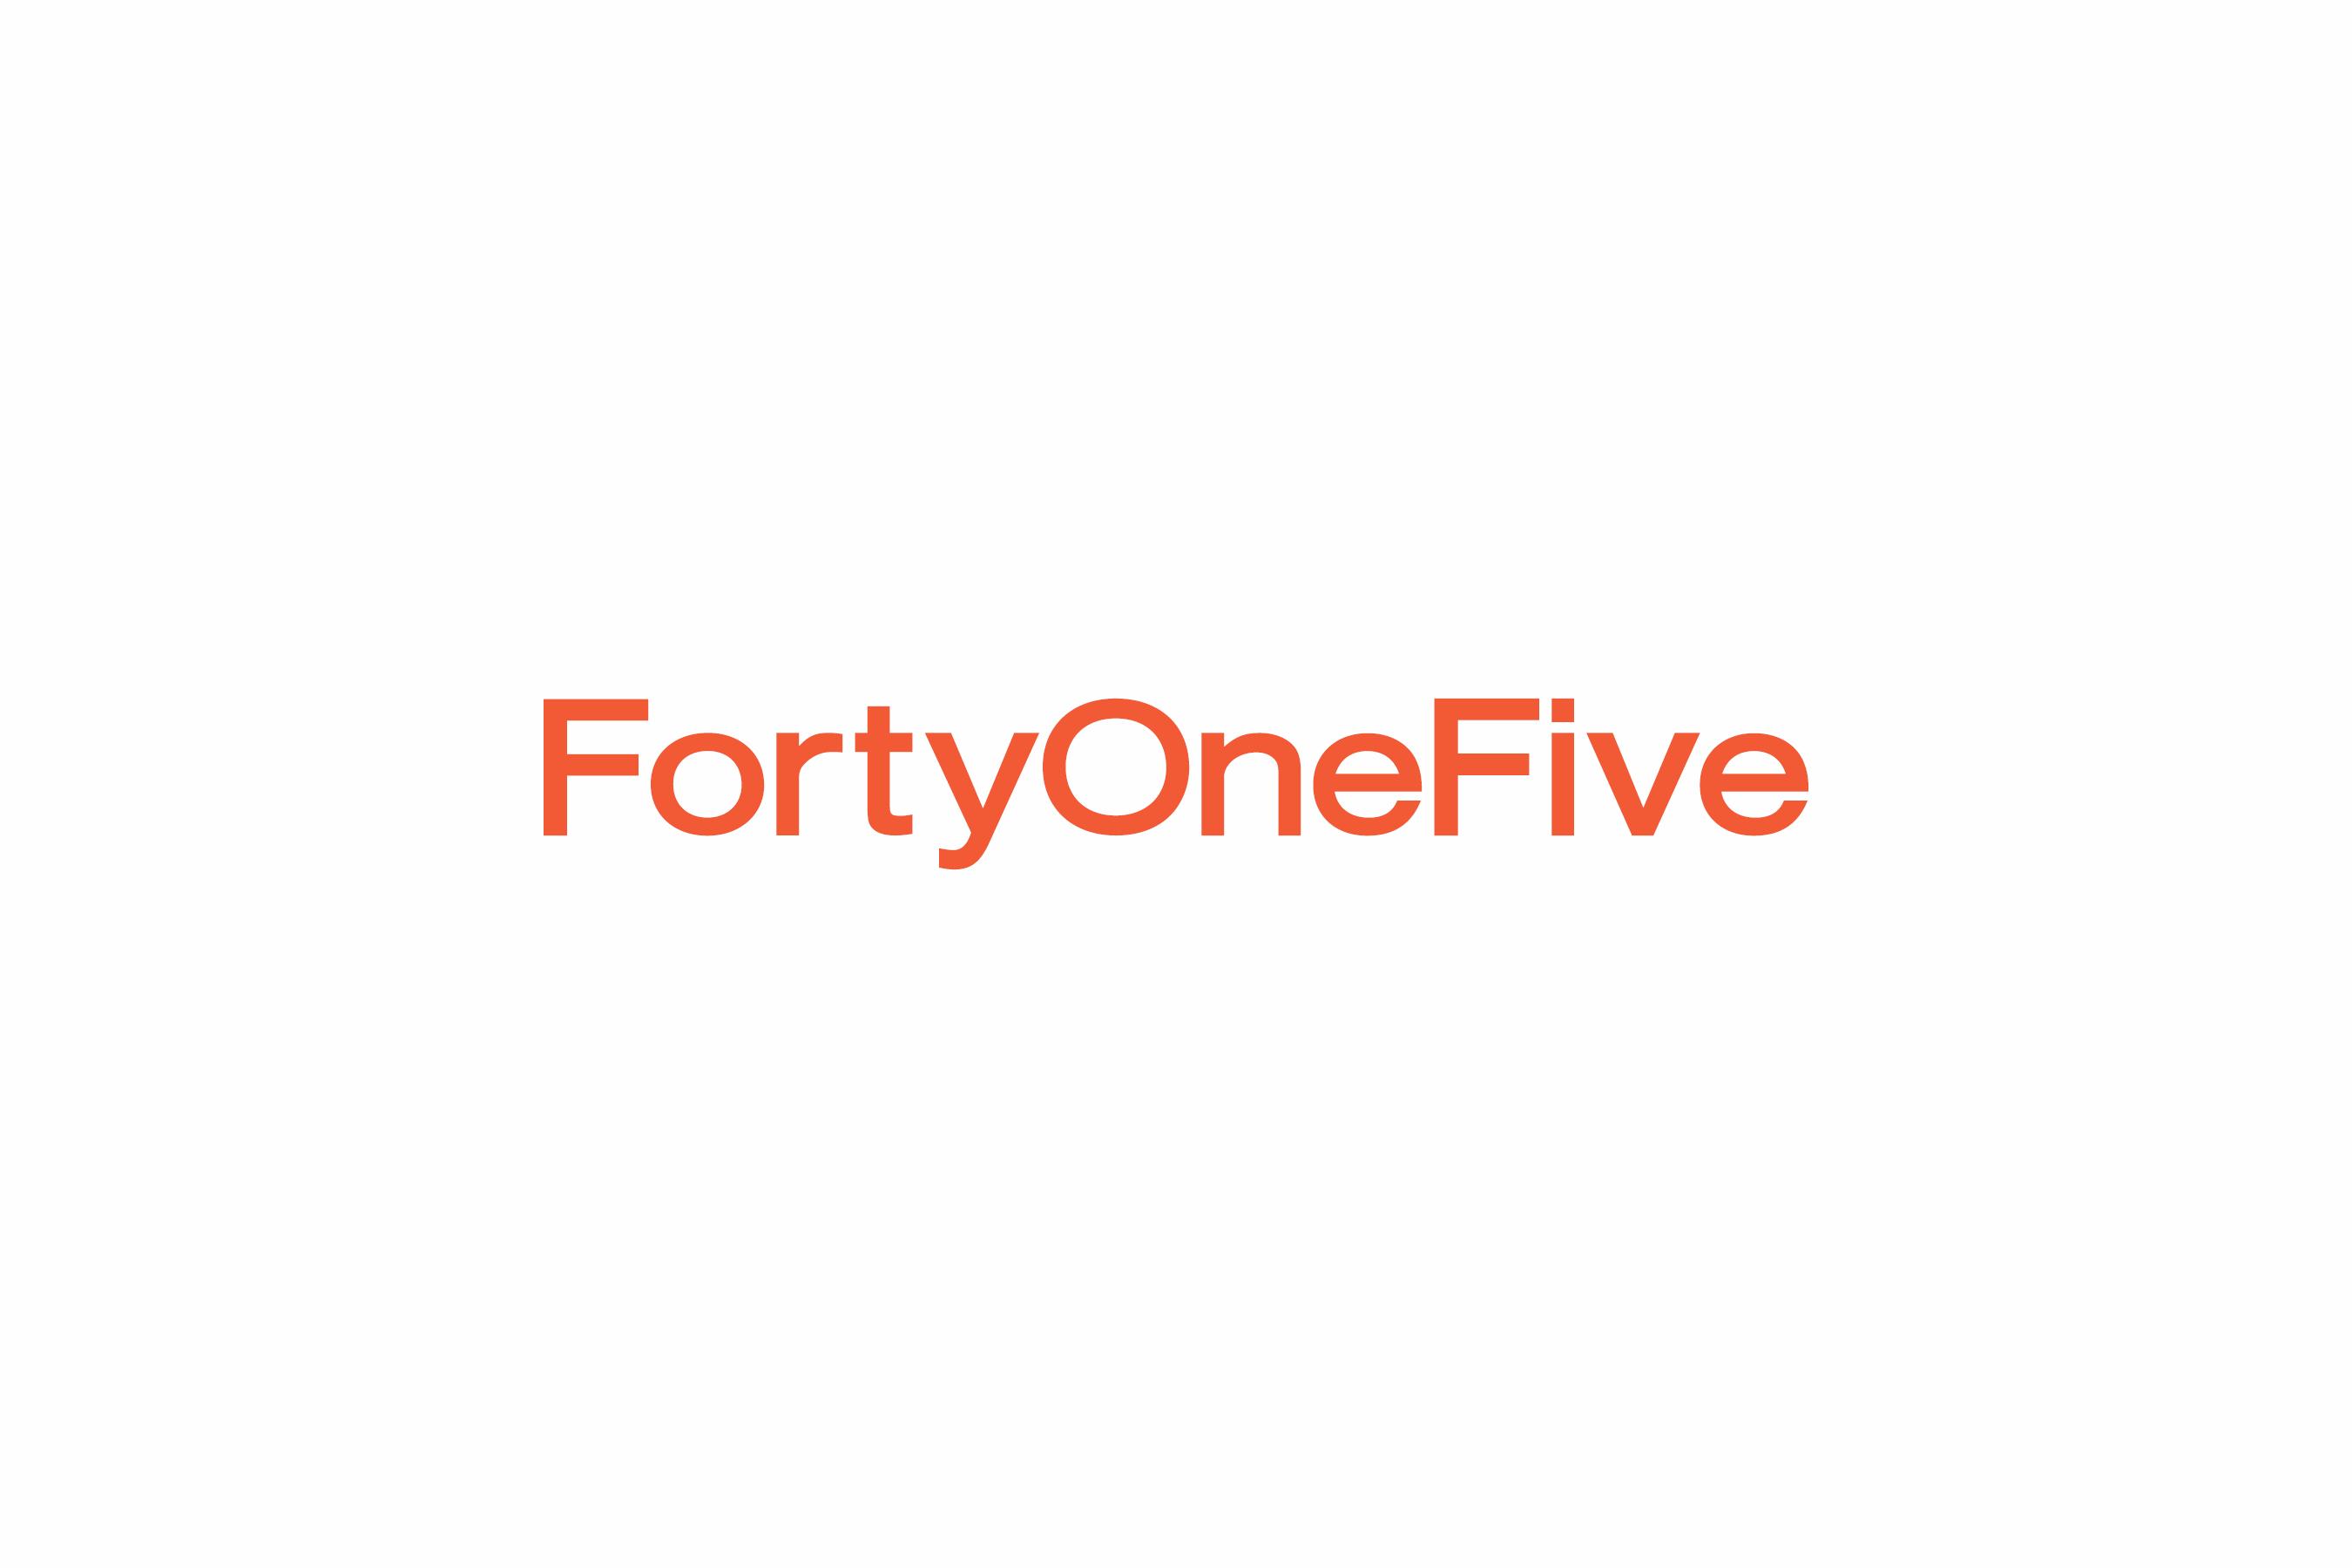 fortyonefive-identity